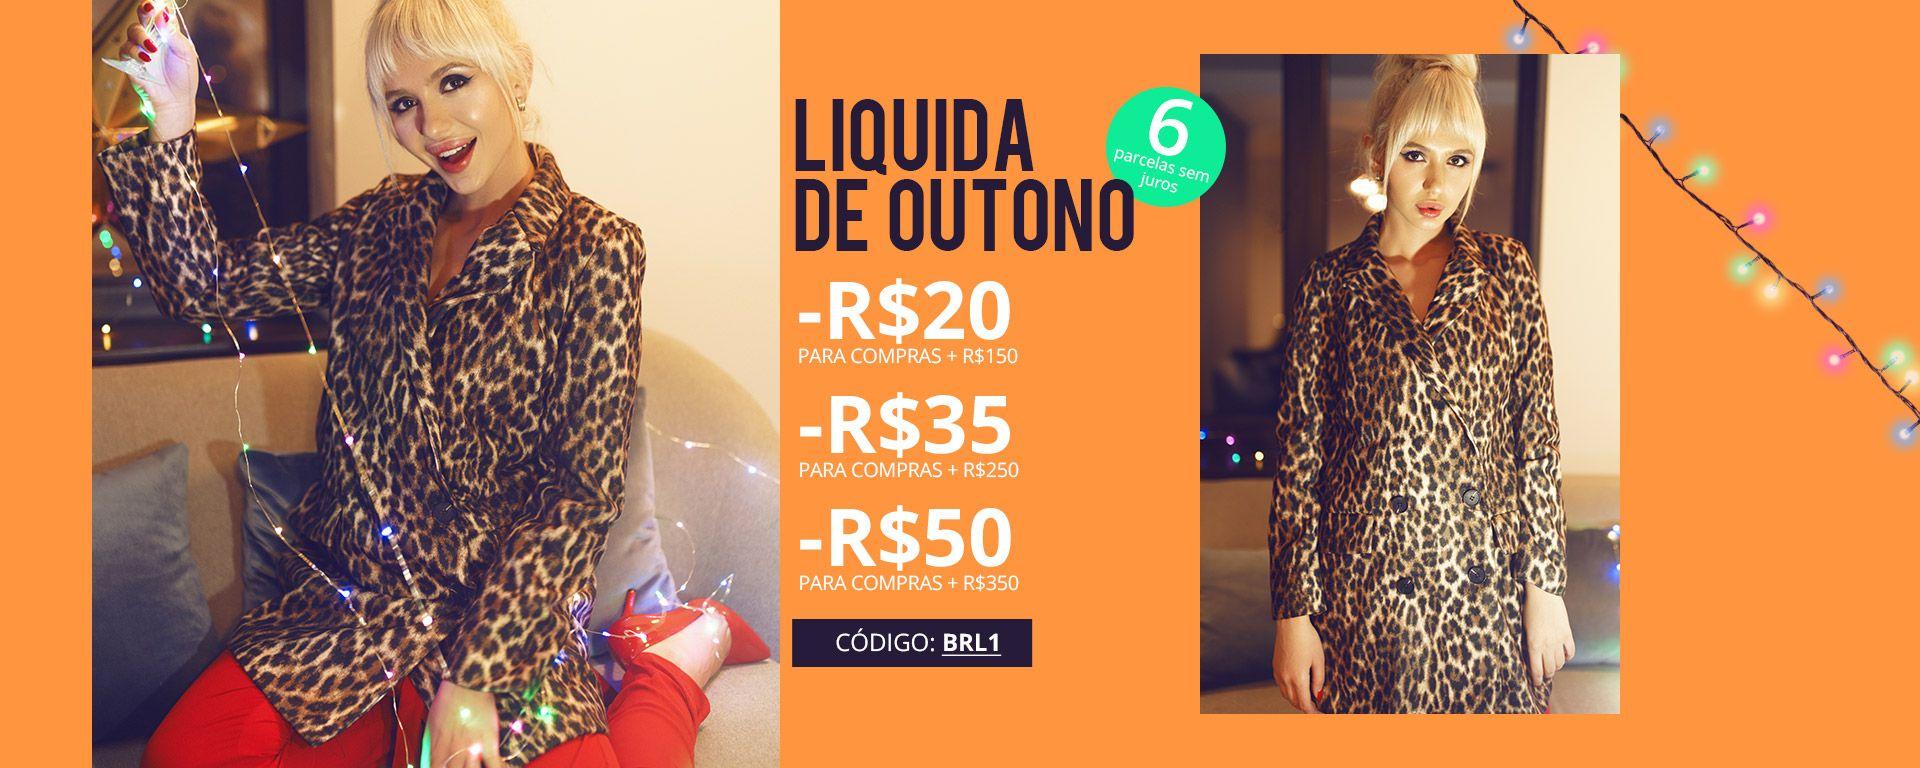 284d769ad ZAFUL Brasil:Tendências Da Moda de Roupas Femininas Compras on-line